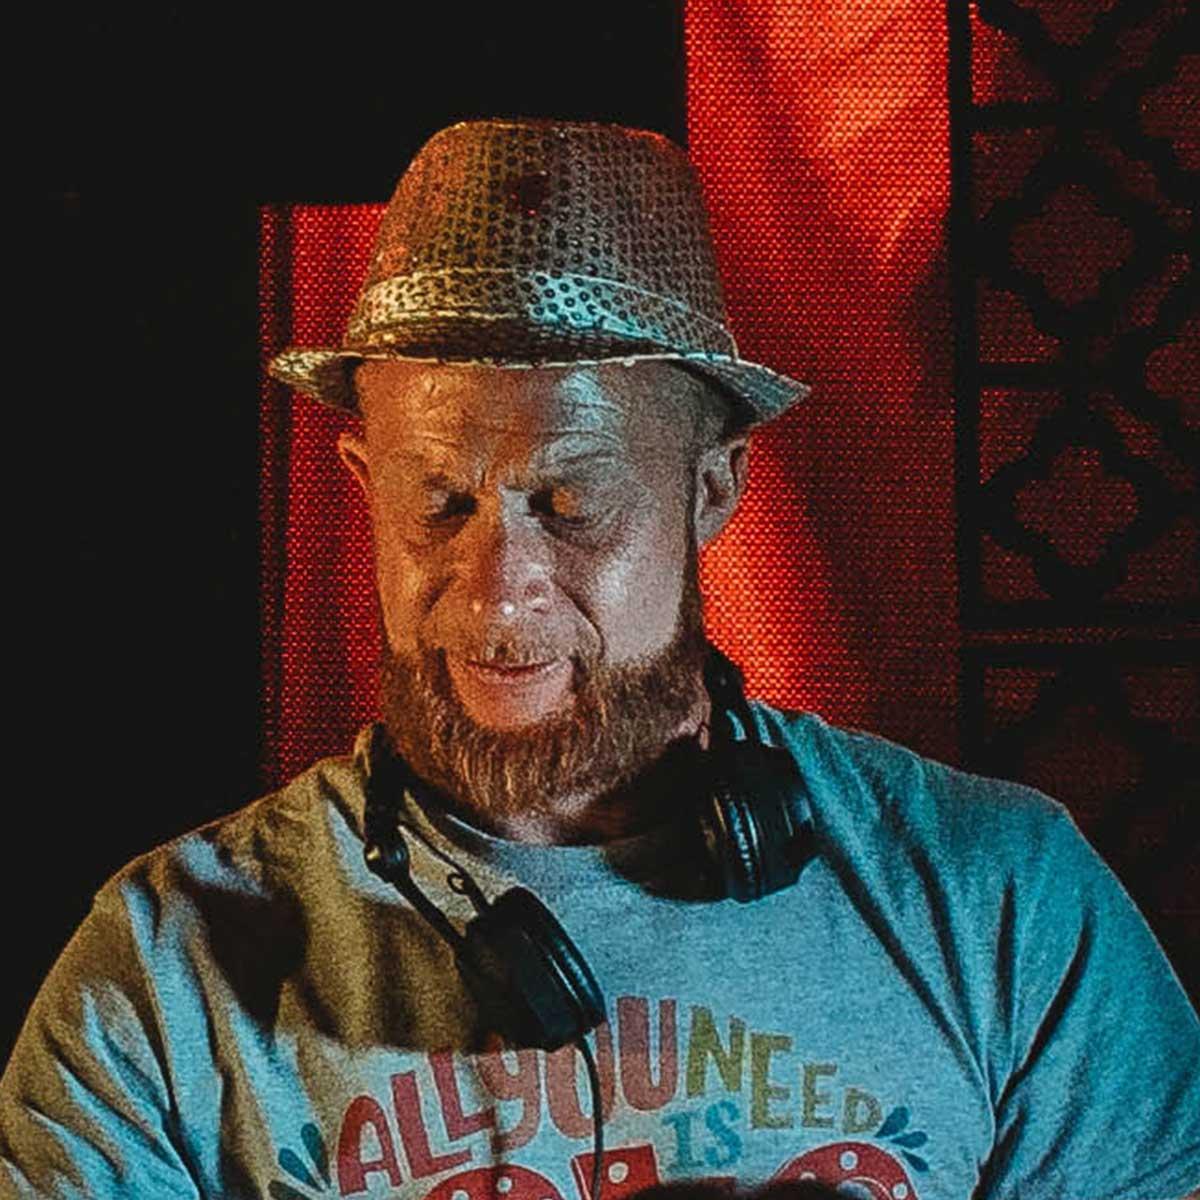 Wayne Altham